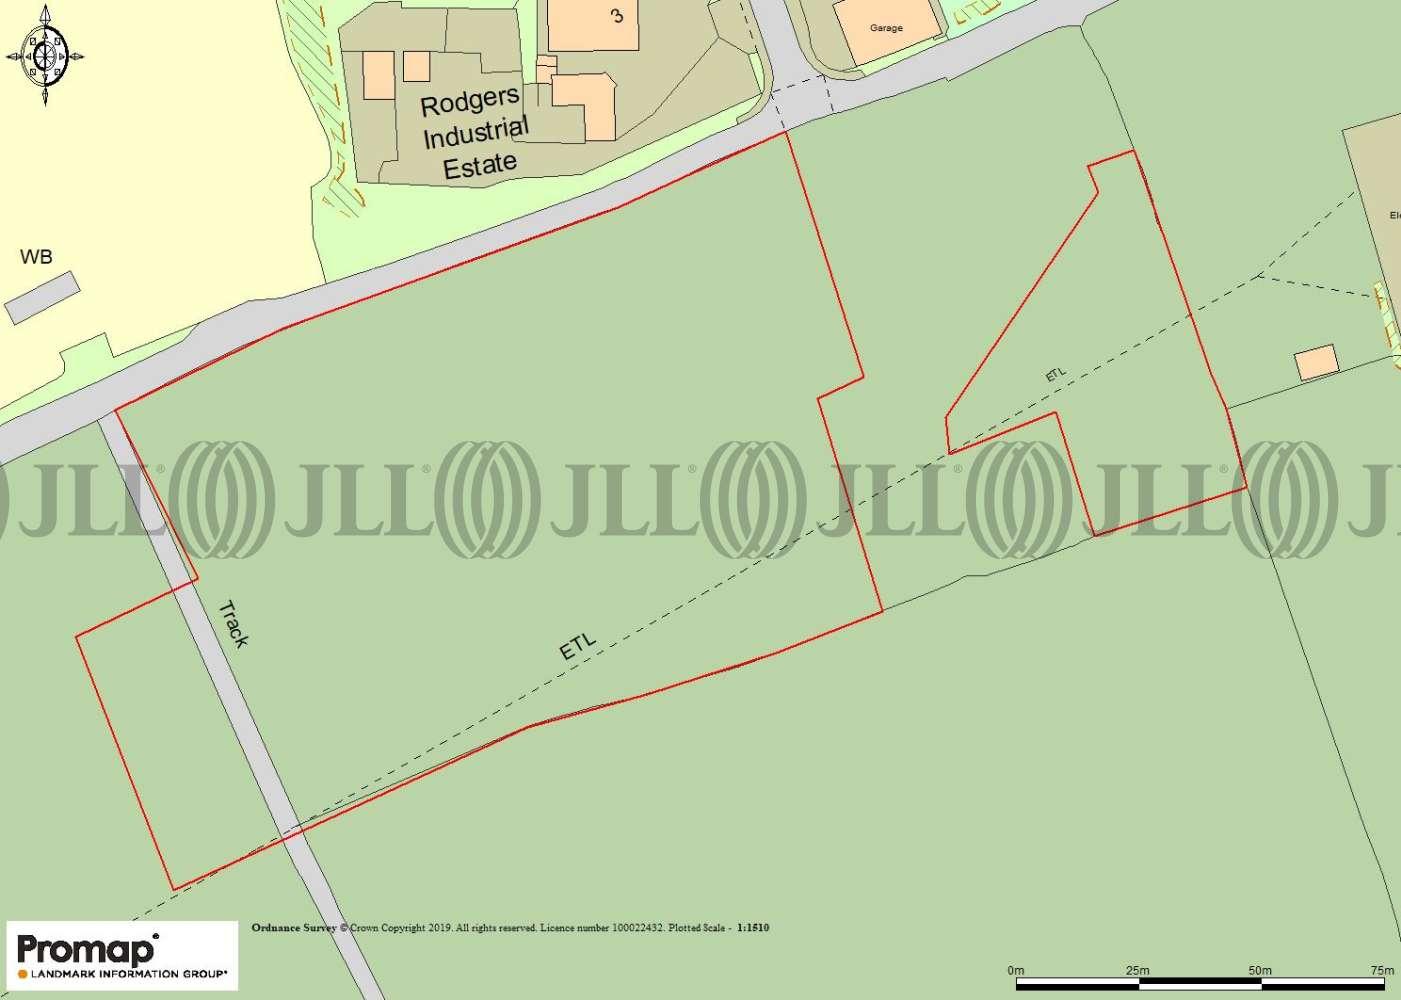 Industrial Paignton, TQ4 7PE - Yannons Farm - 86205